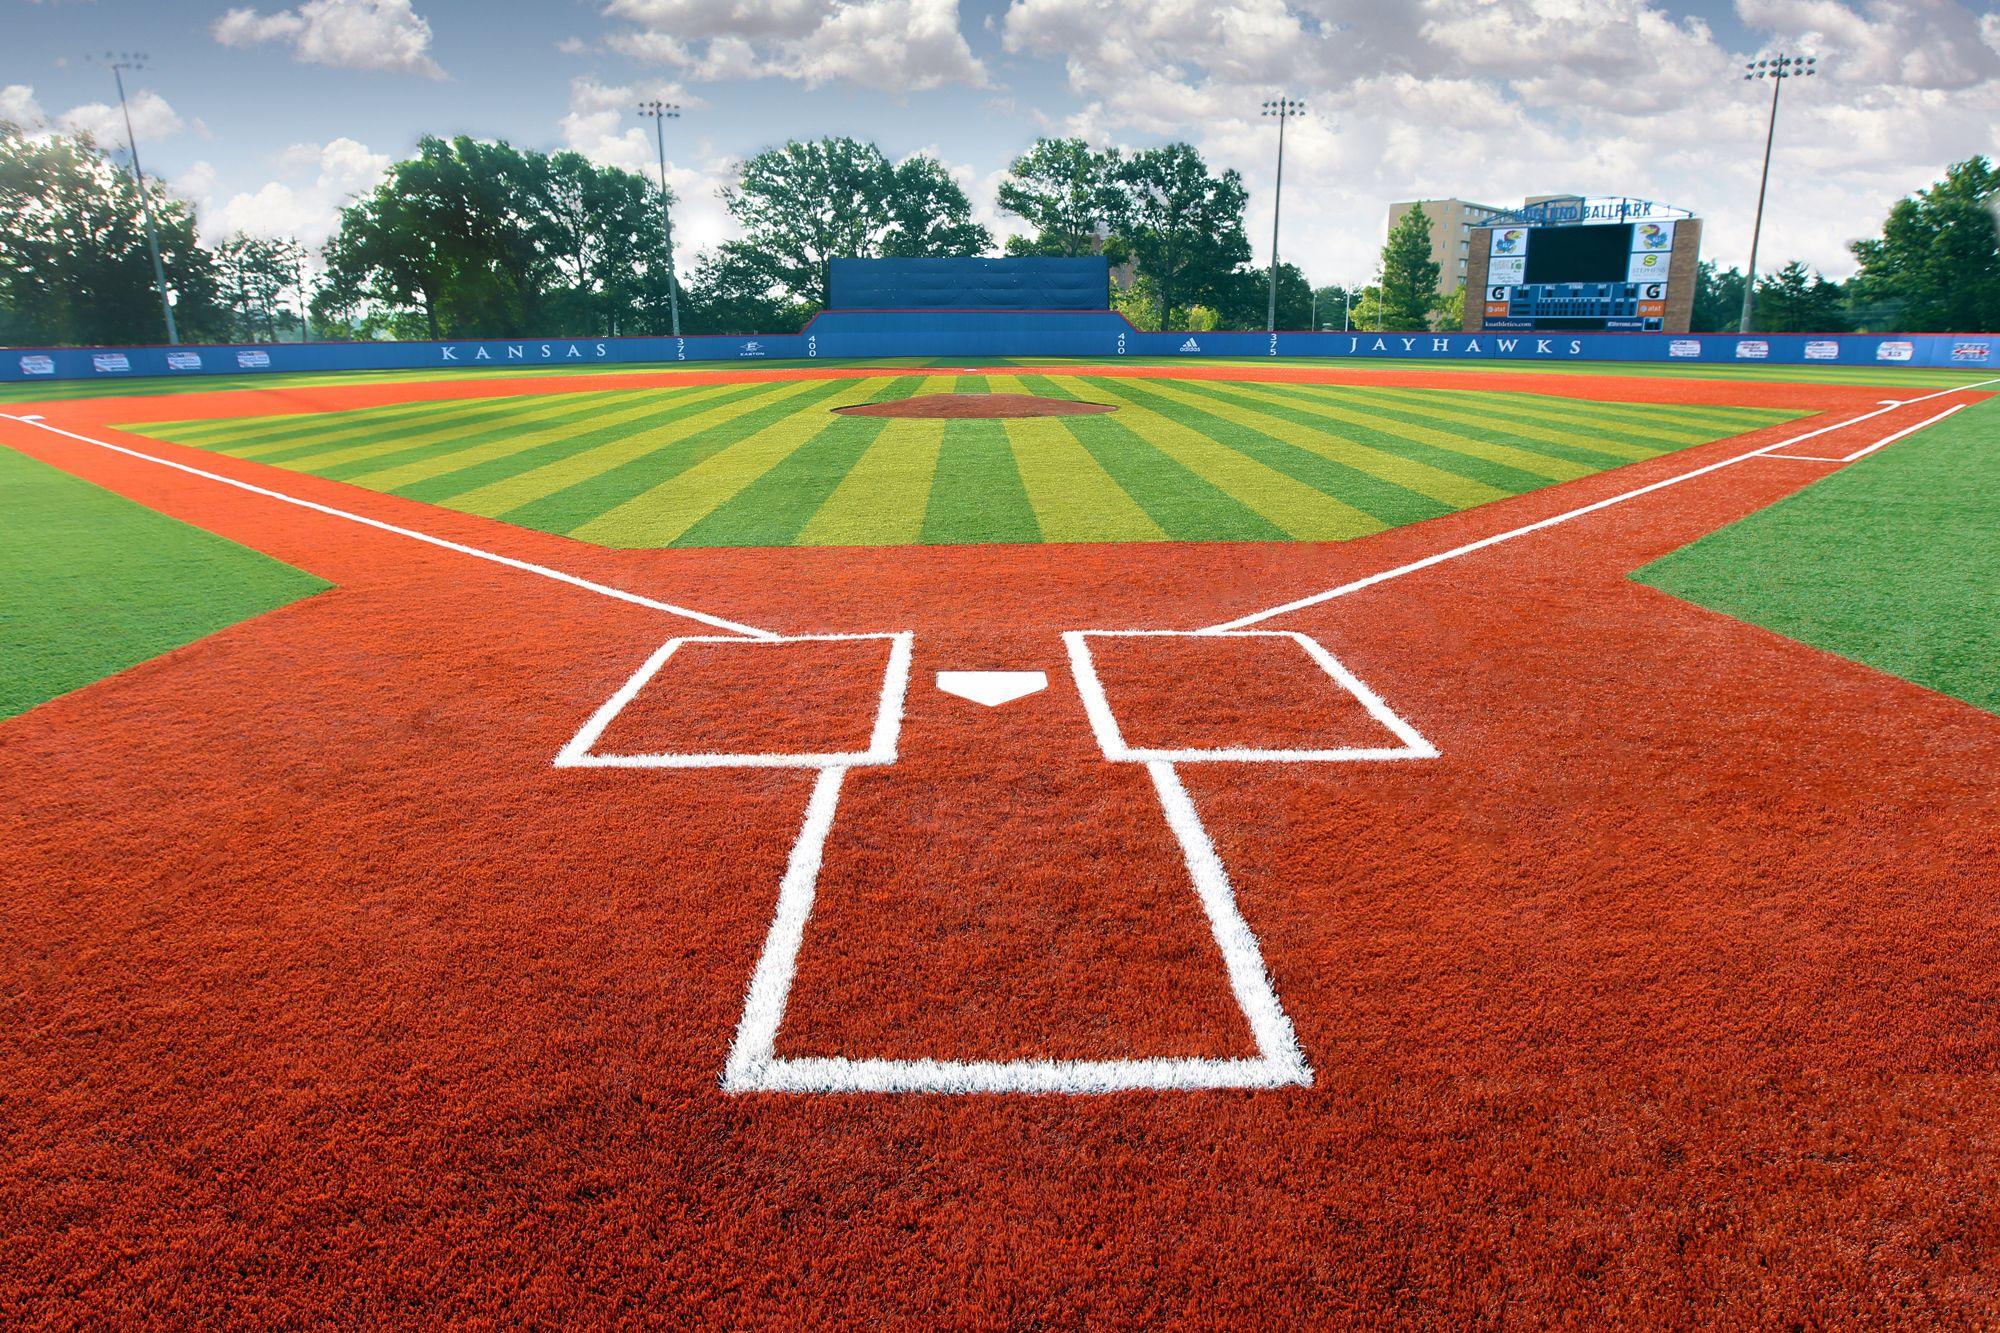 University Of Kansas Hoglund Ballpark 135 003 Square Feet Of Astroturf Gameday Grass 3d Installed In 2010 Astro Turf College Sports Baseball Field